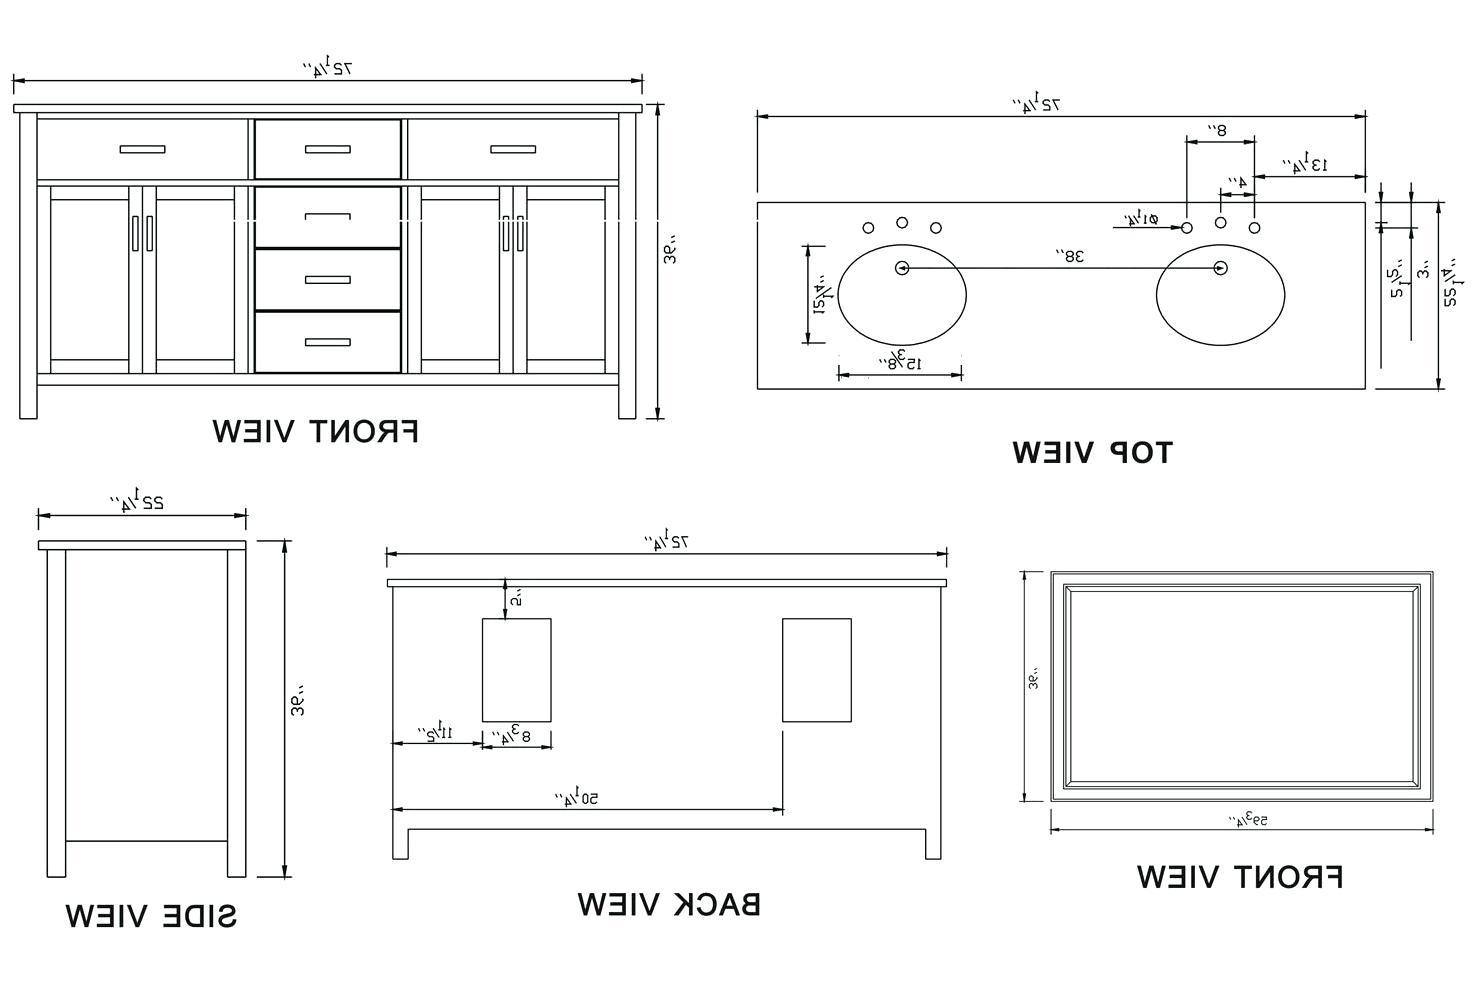 Sink Plumbing Diagram Bathroom Sink Plumbing Rough In Getintoenergyms